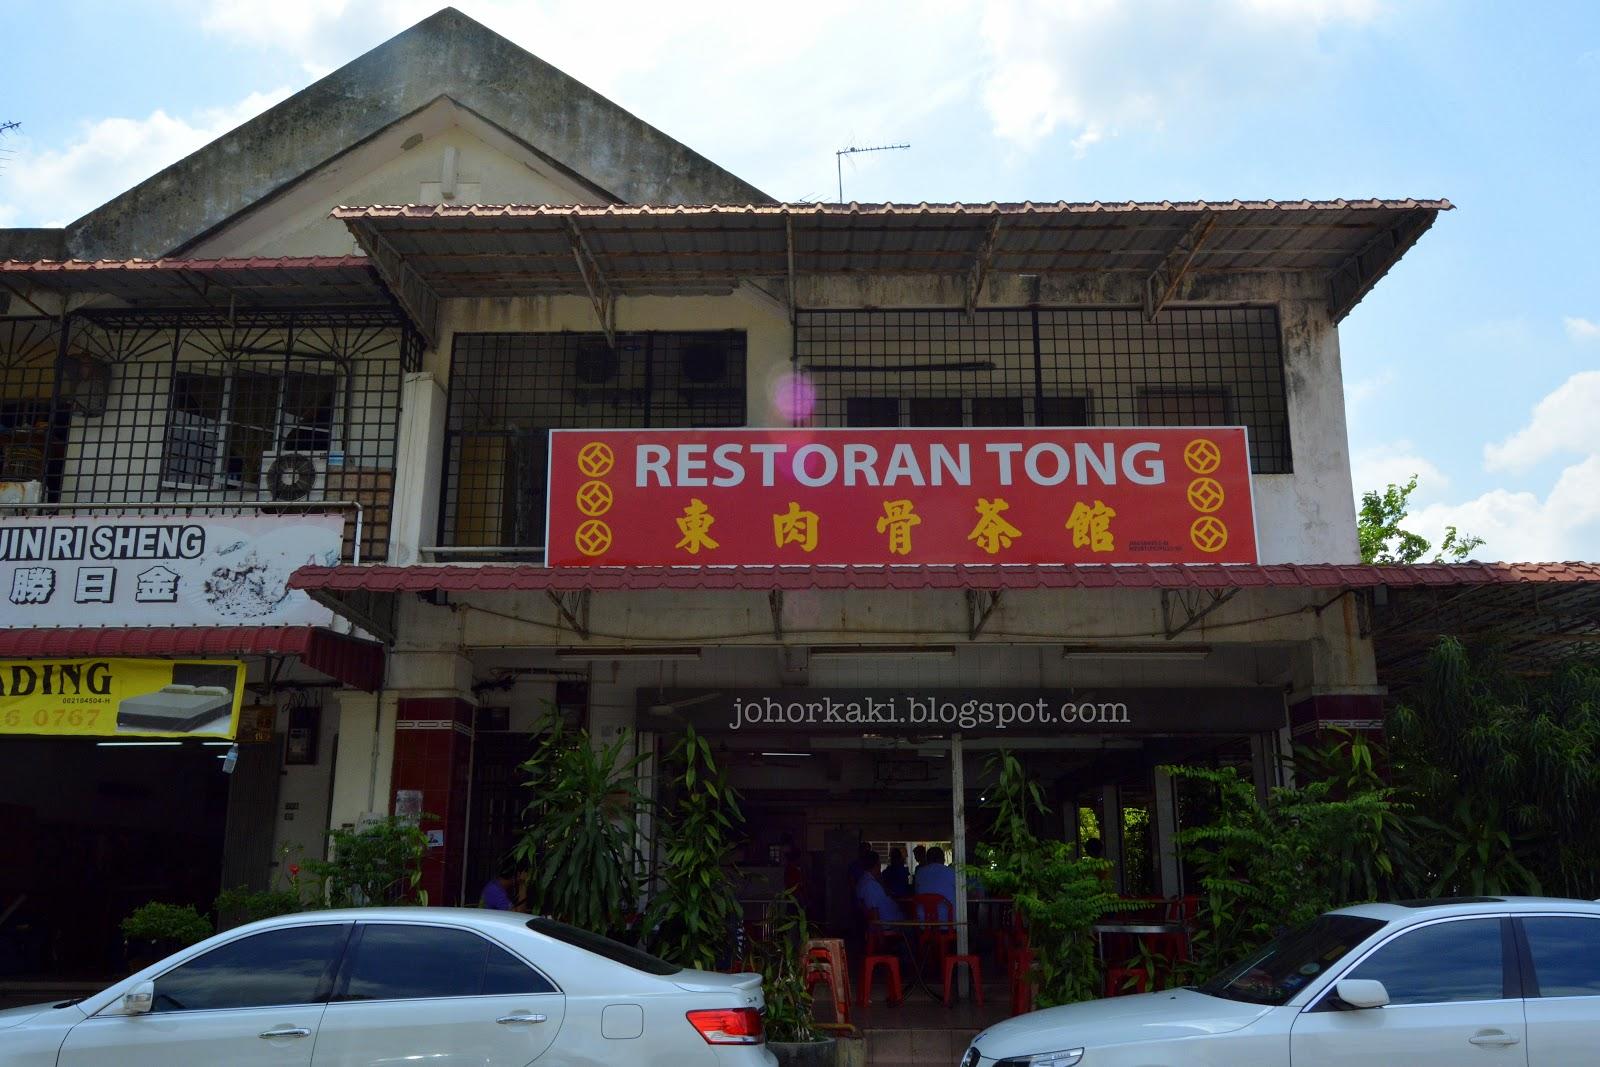 Restoran tong in skudai johor bahru jb jk1166 johor for Chinese furniture johor bahru